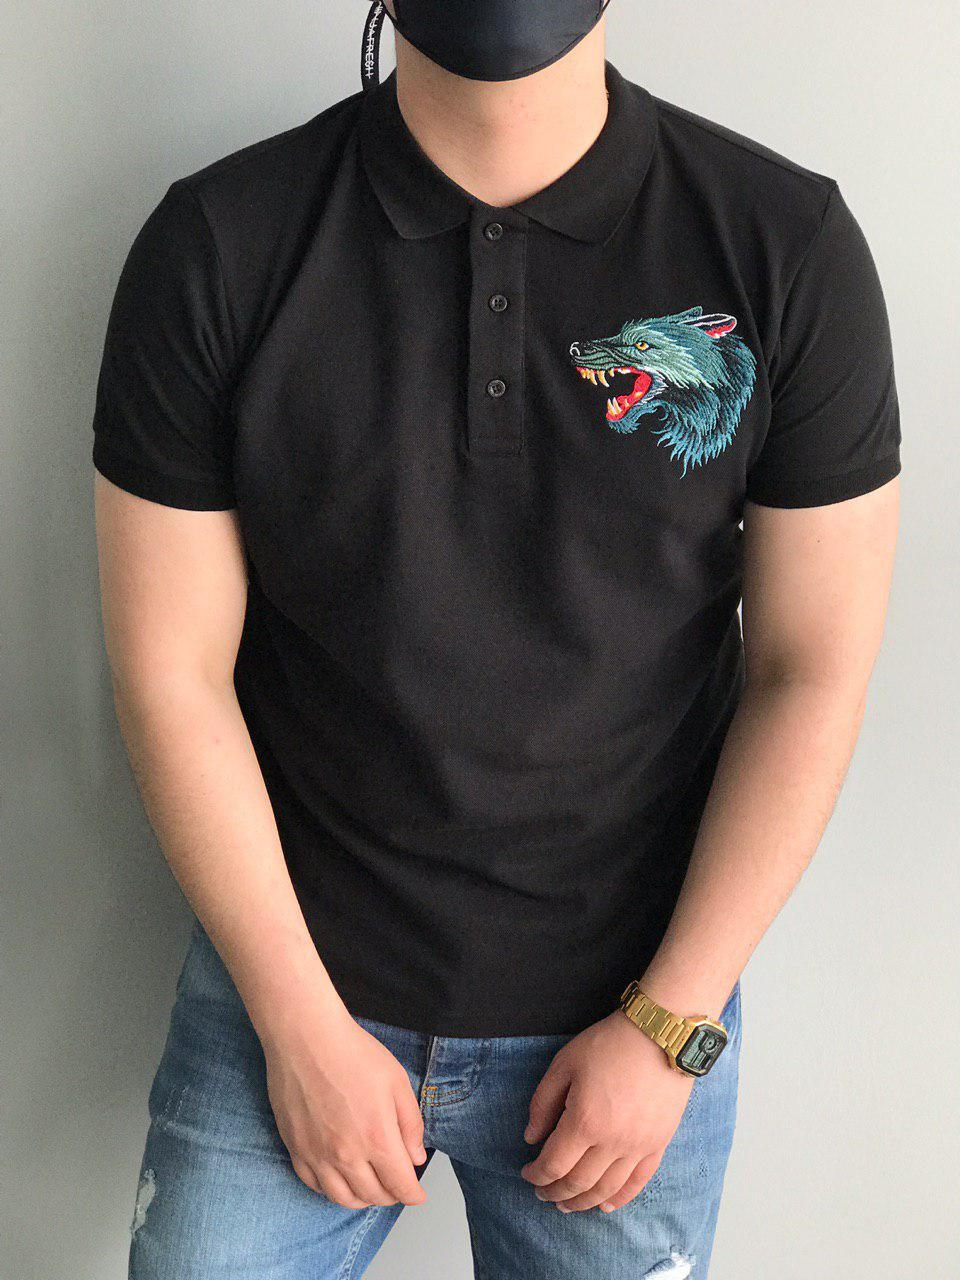 Мужская футболка поло черная Gucci Wolf (реплика)